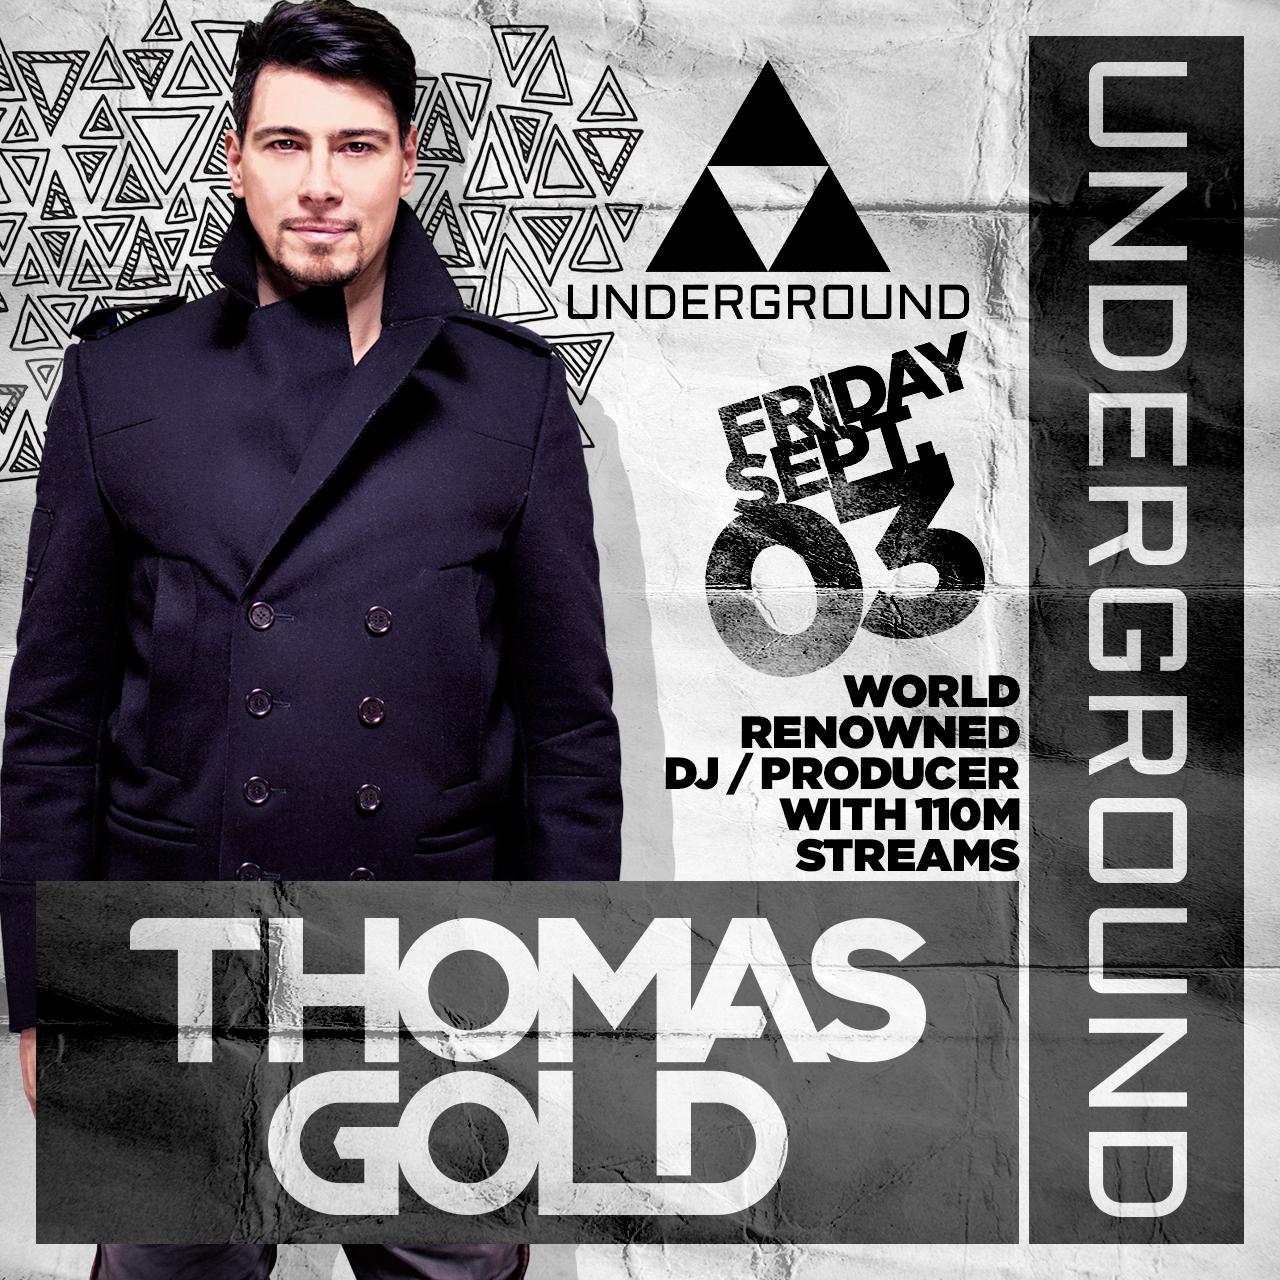 Thomas-Gold-The Underground Chicago-21